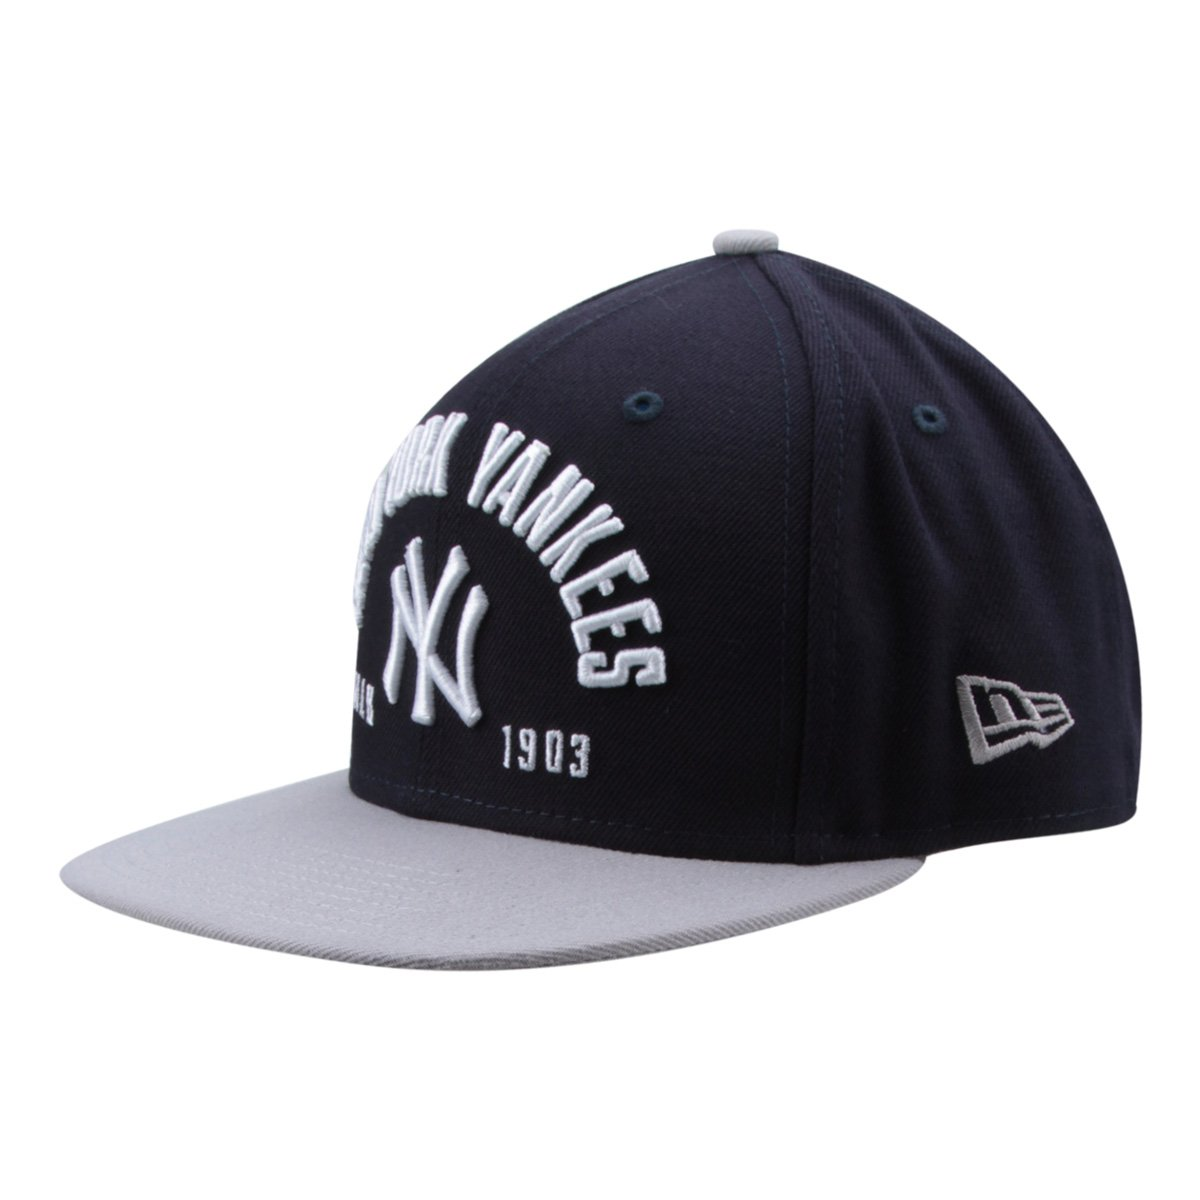 Boné New Era MLB New York Yankees Aba Reta Street - Compre Agora ... 99ece627980